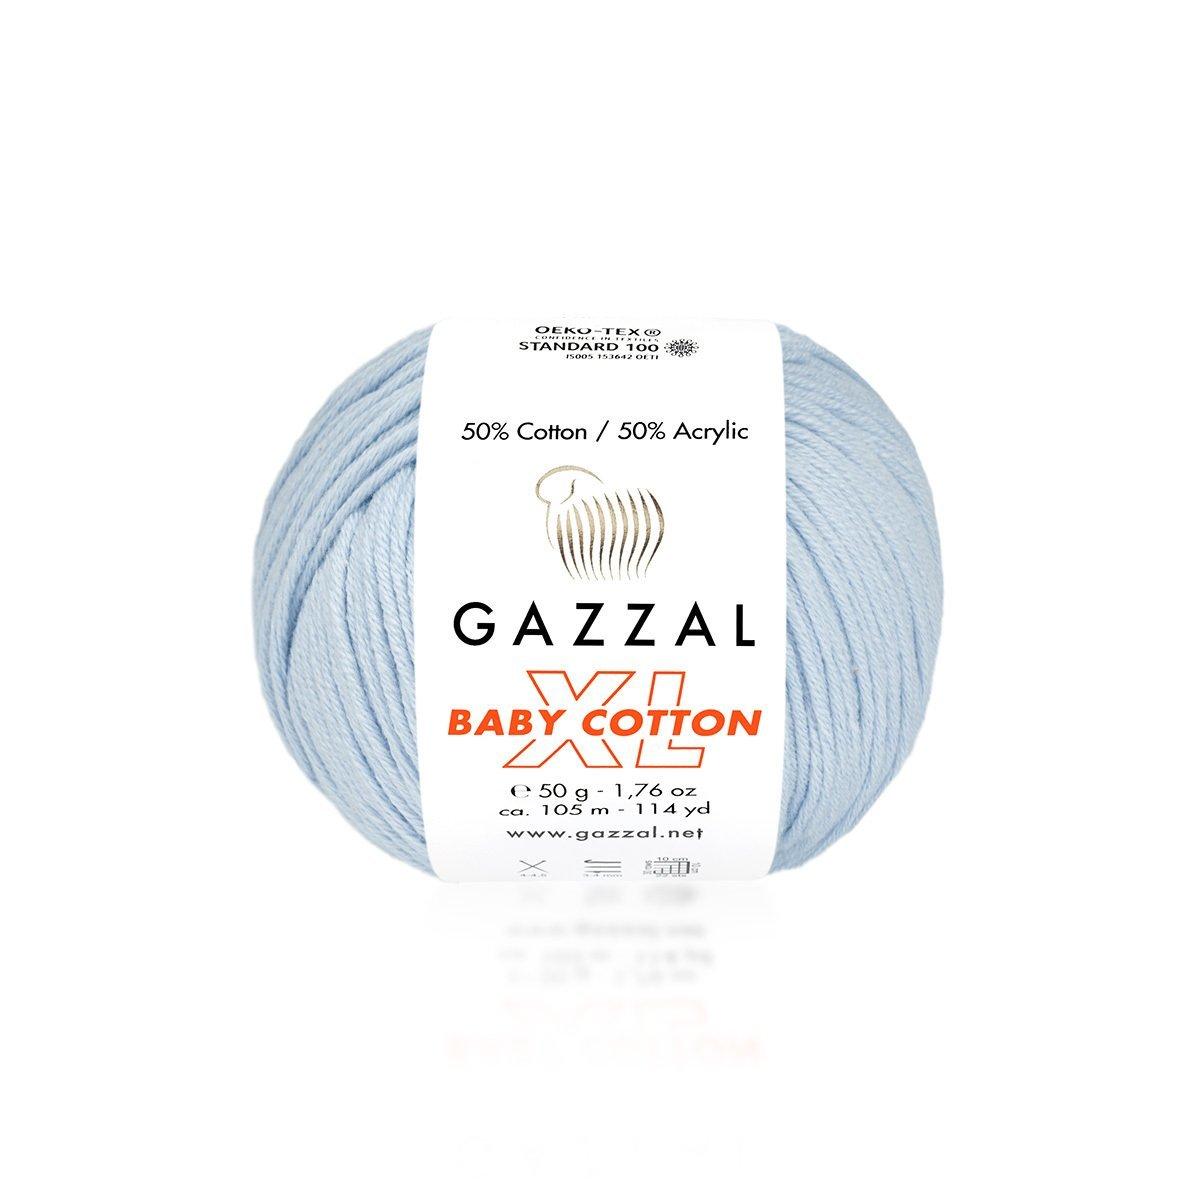 Пряжа Gazzal Baby Cotton XL 3429 нежно-голубой